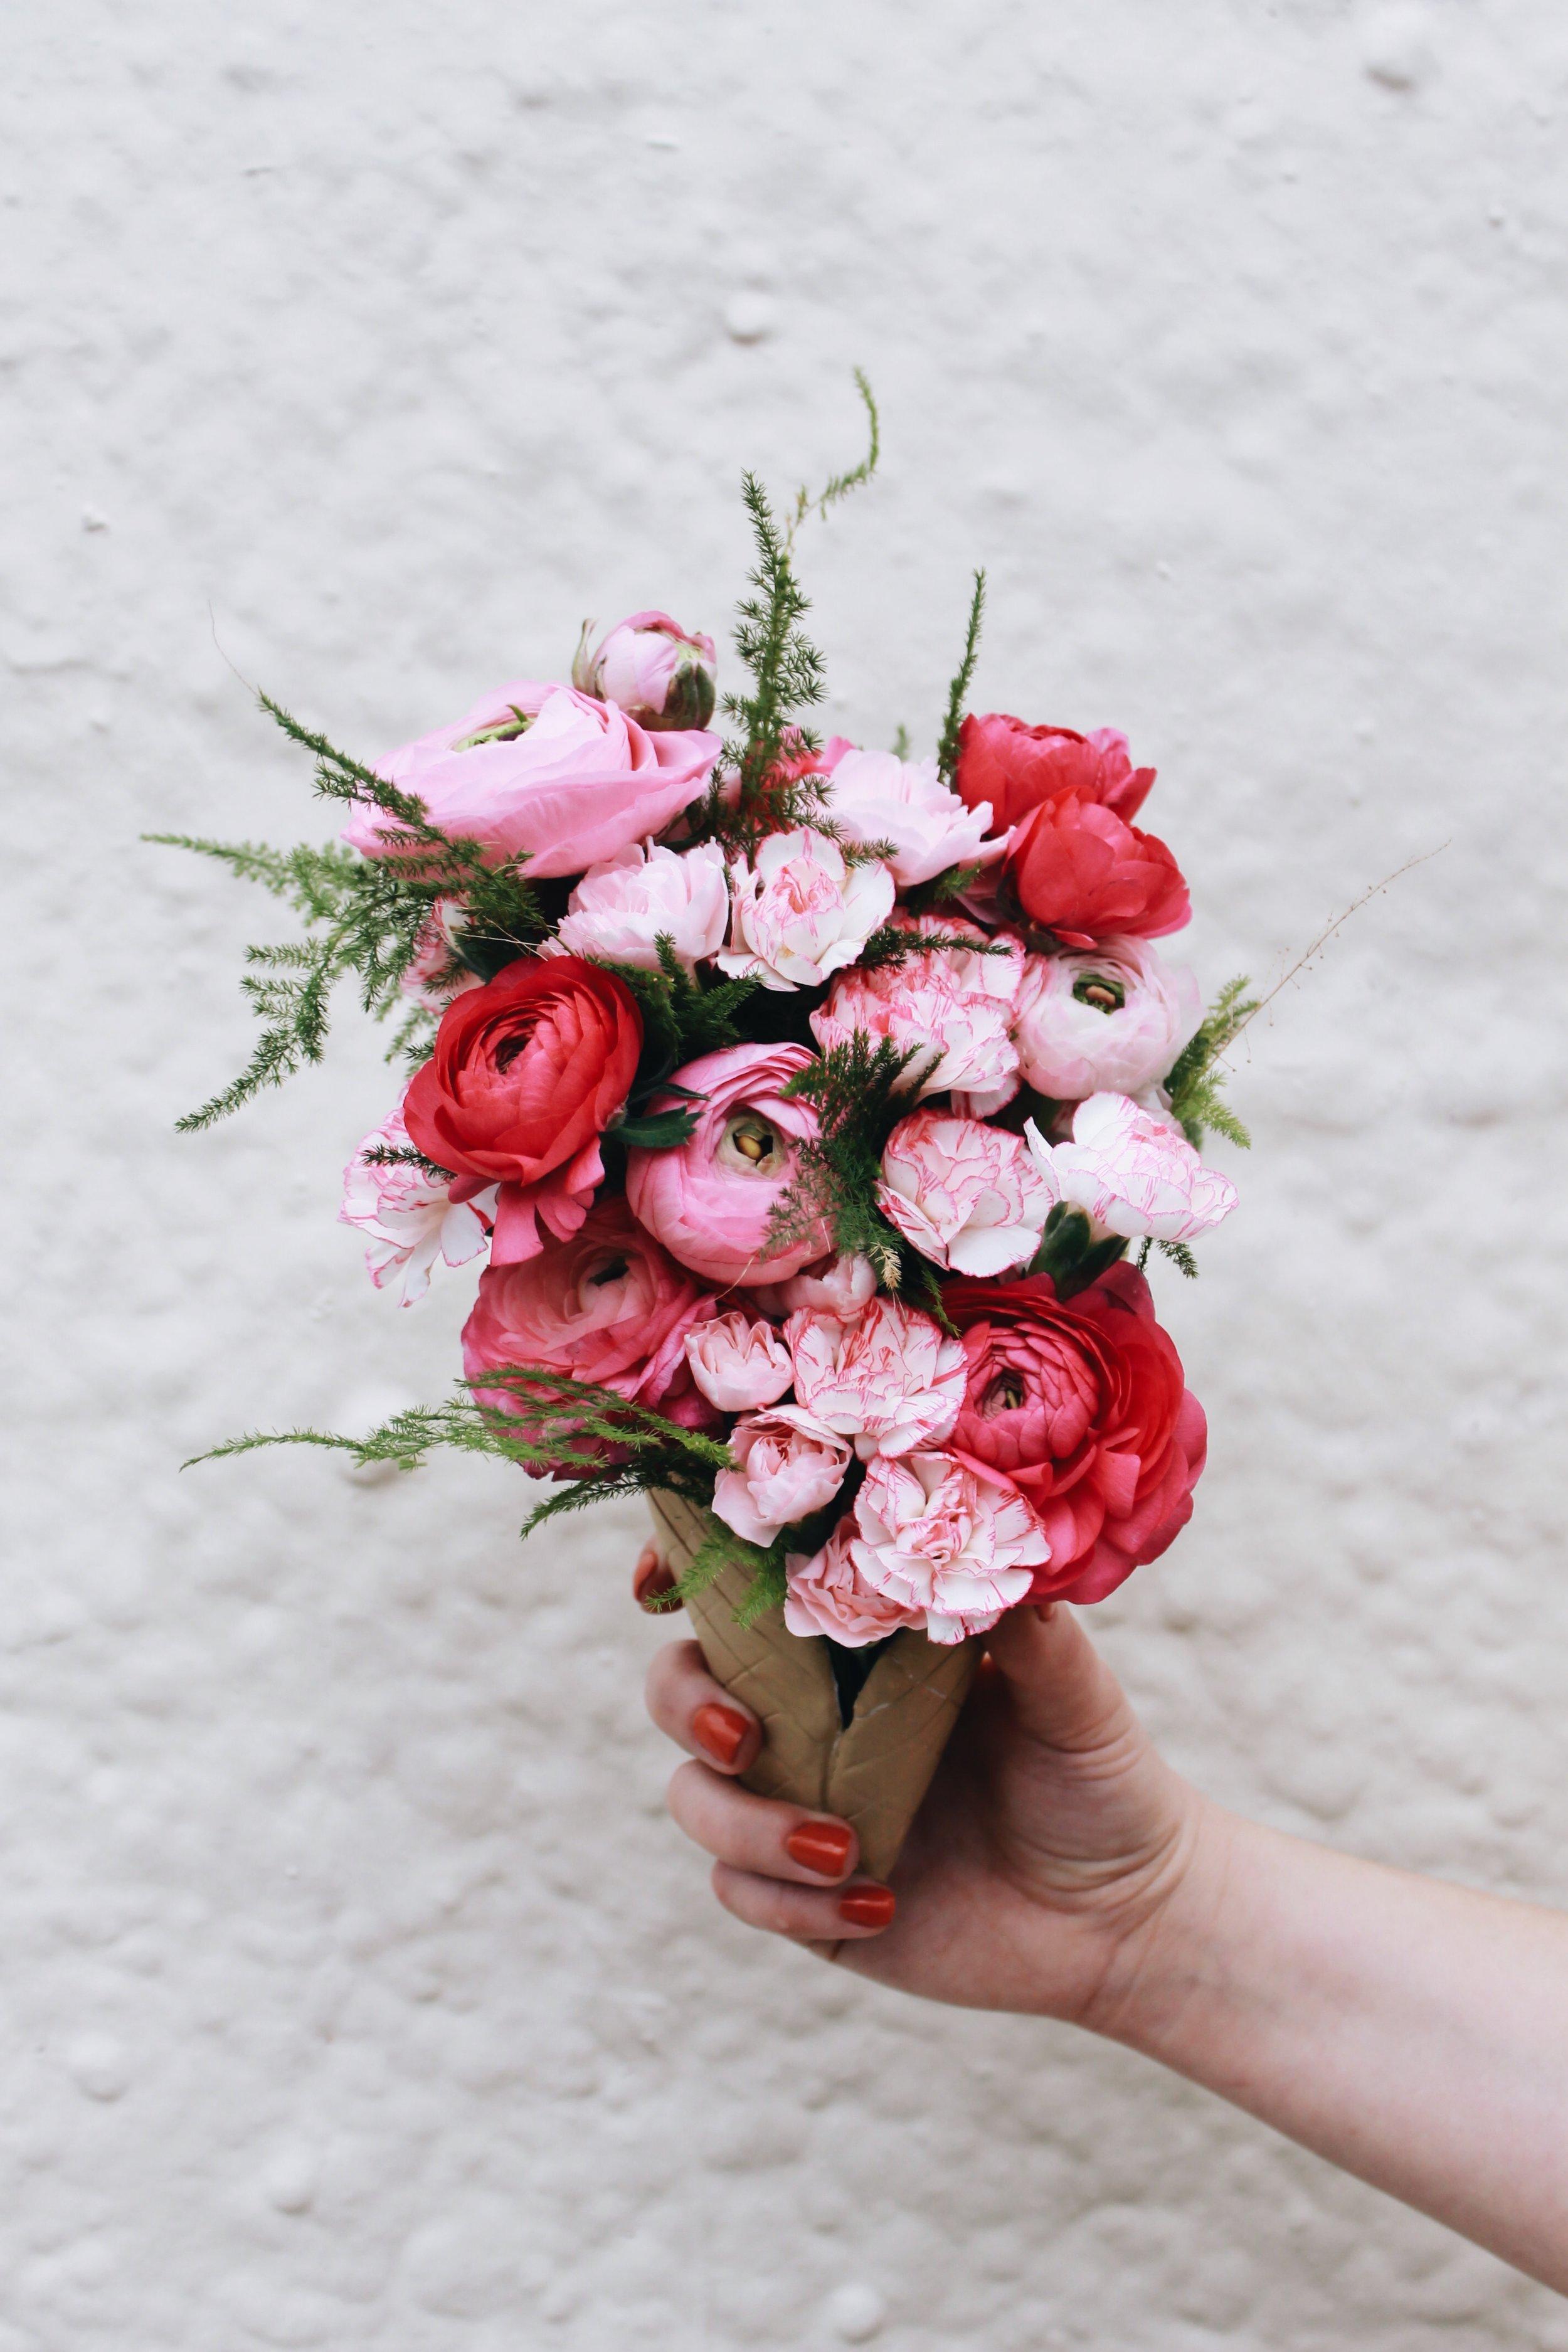 Elopement - starting at $750The Bride's Bouquet1-2 Bridesmaid Bouquets1-3 Boutonnieres3-5 Centerpieces